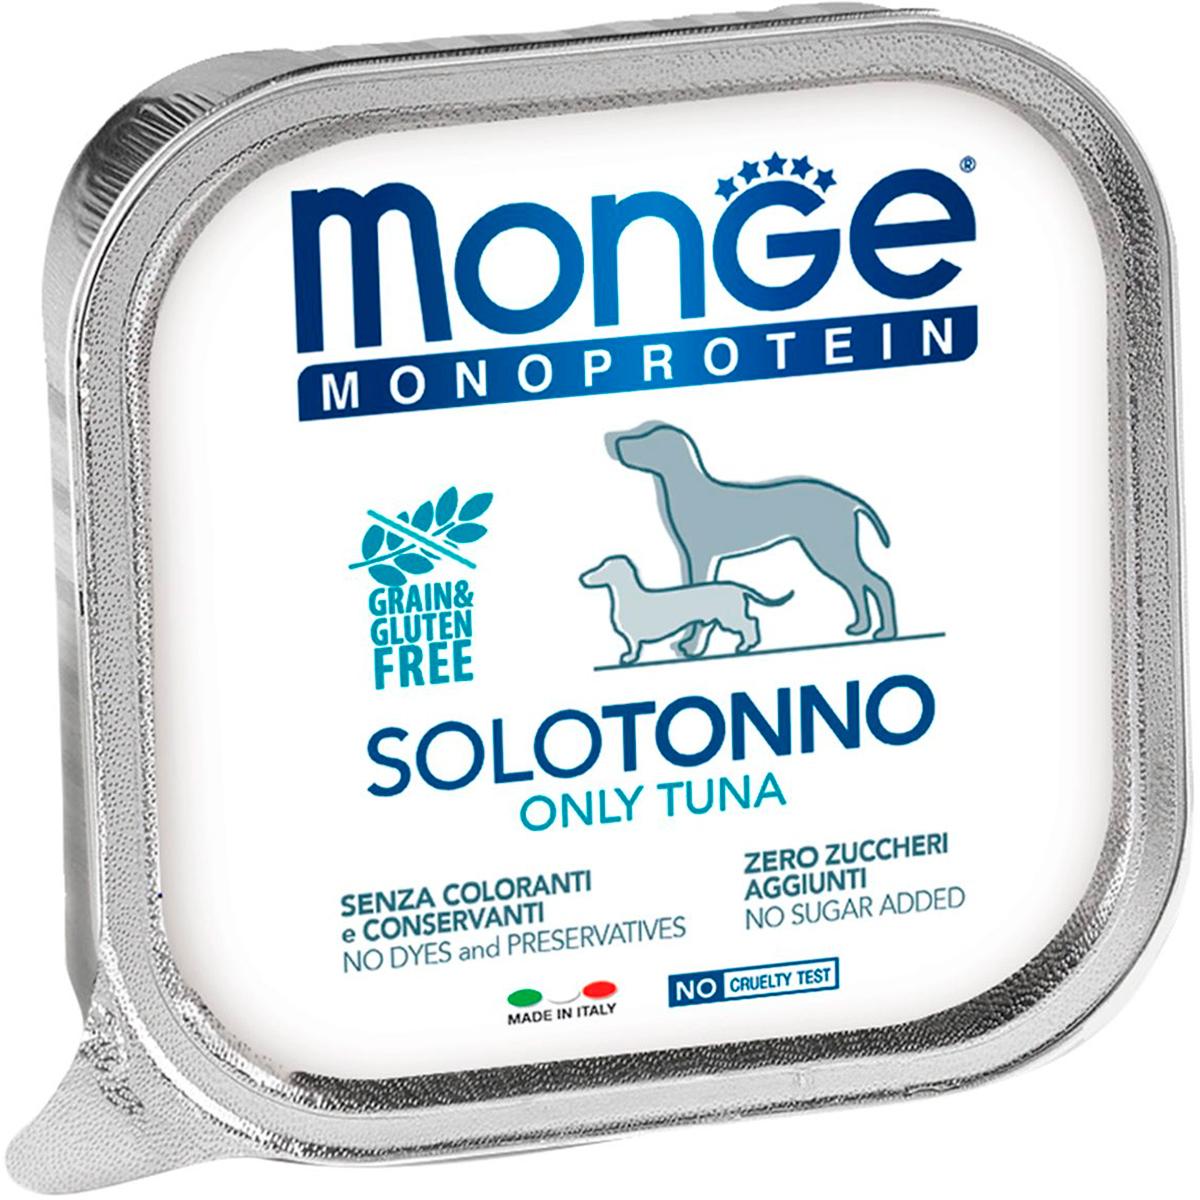 Monge Monoprotein Solo Dog монобелковые для взрослых собак паштет с тунцом 70014168bs (150 гр х 24 шт)